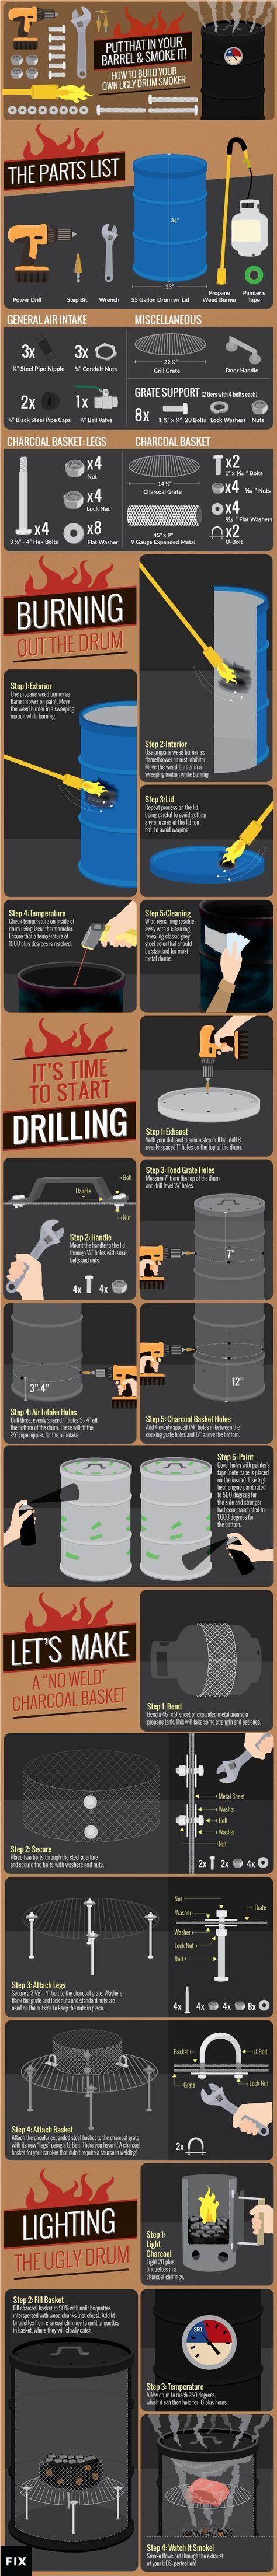 #Smoker aus Ölfass selbstbauen. Build your own ugly drum Smoker #diy #infographic